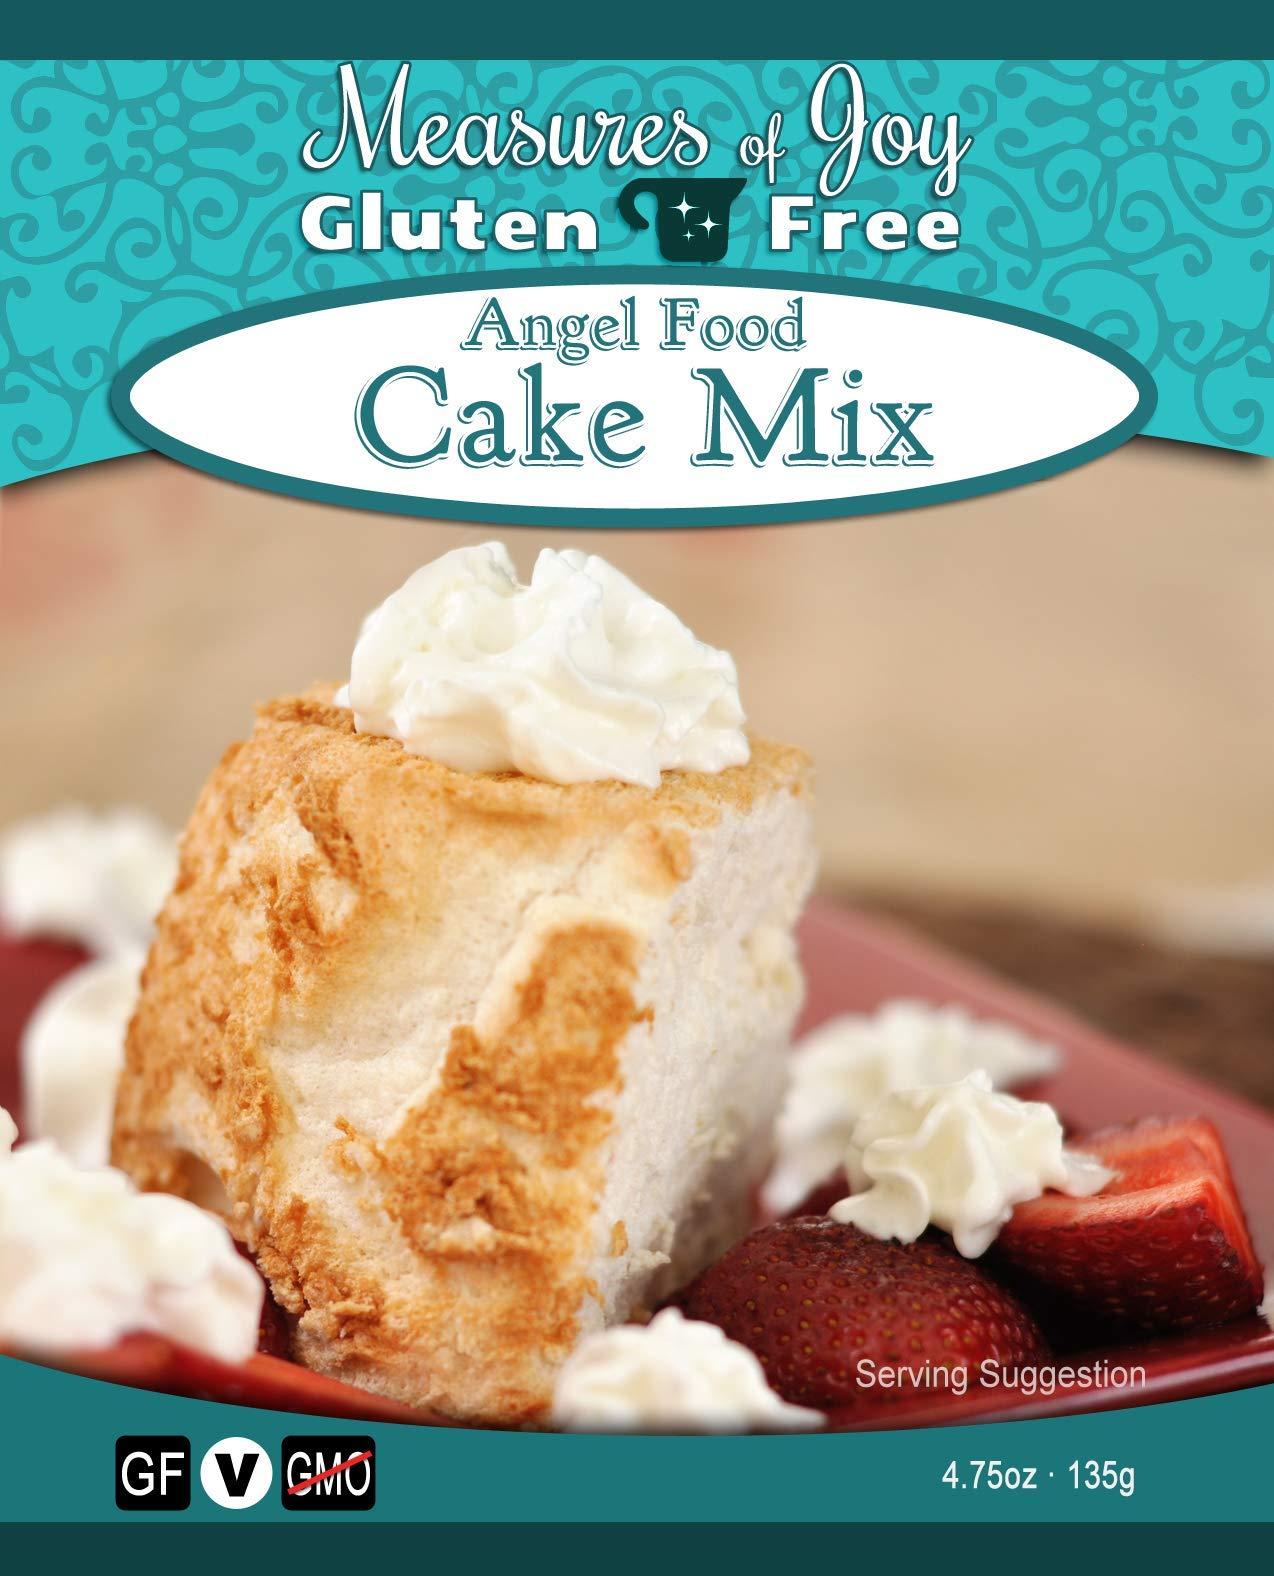 Measures of Joy Gluten Free Angel Food Cake Mix by Measures of Joy